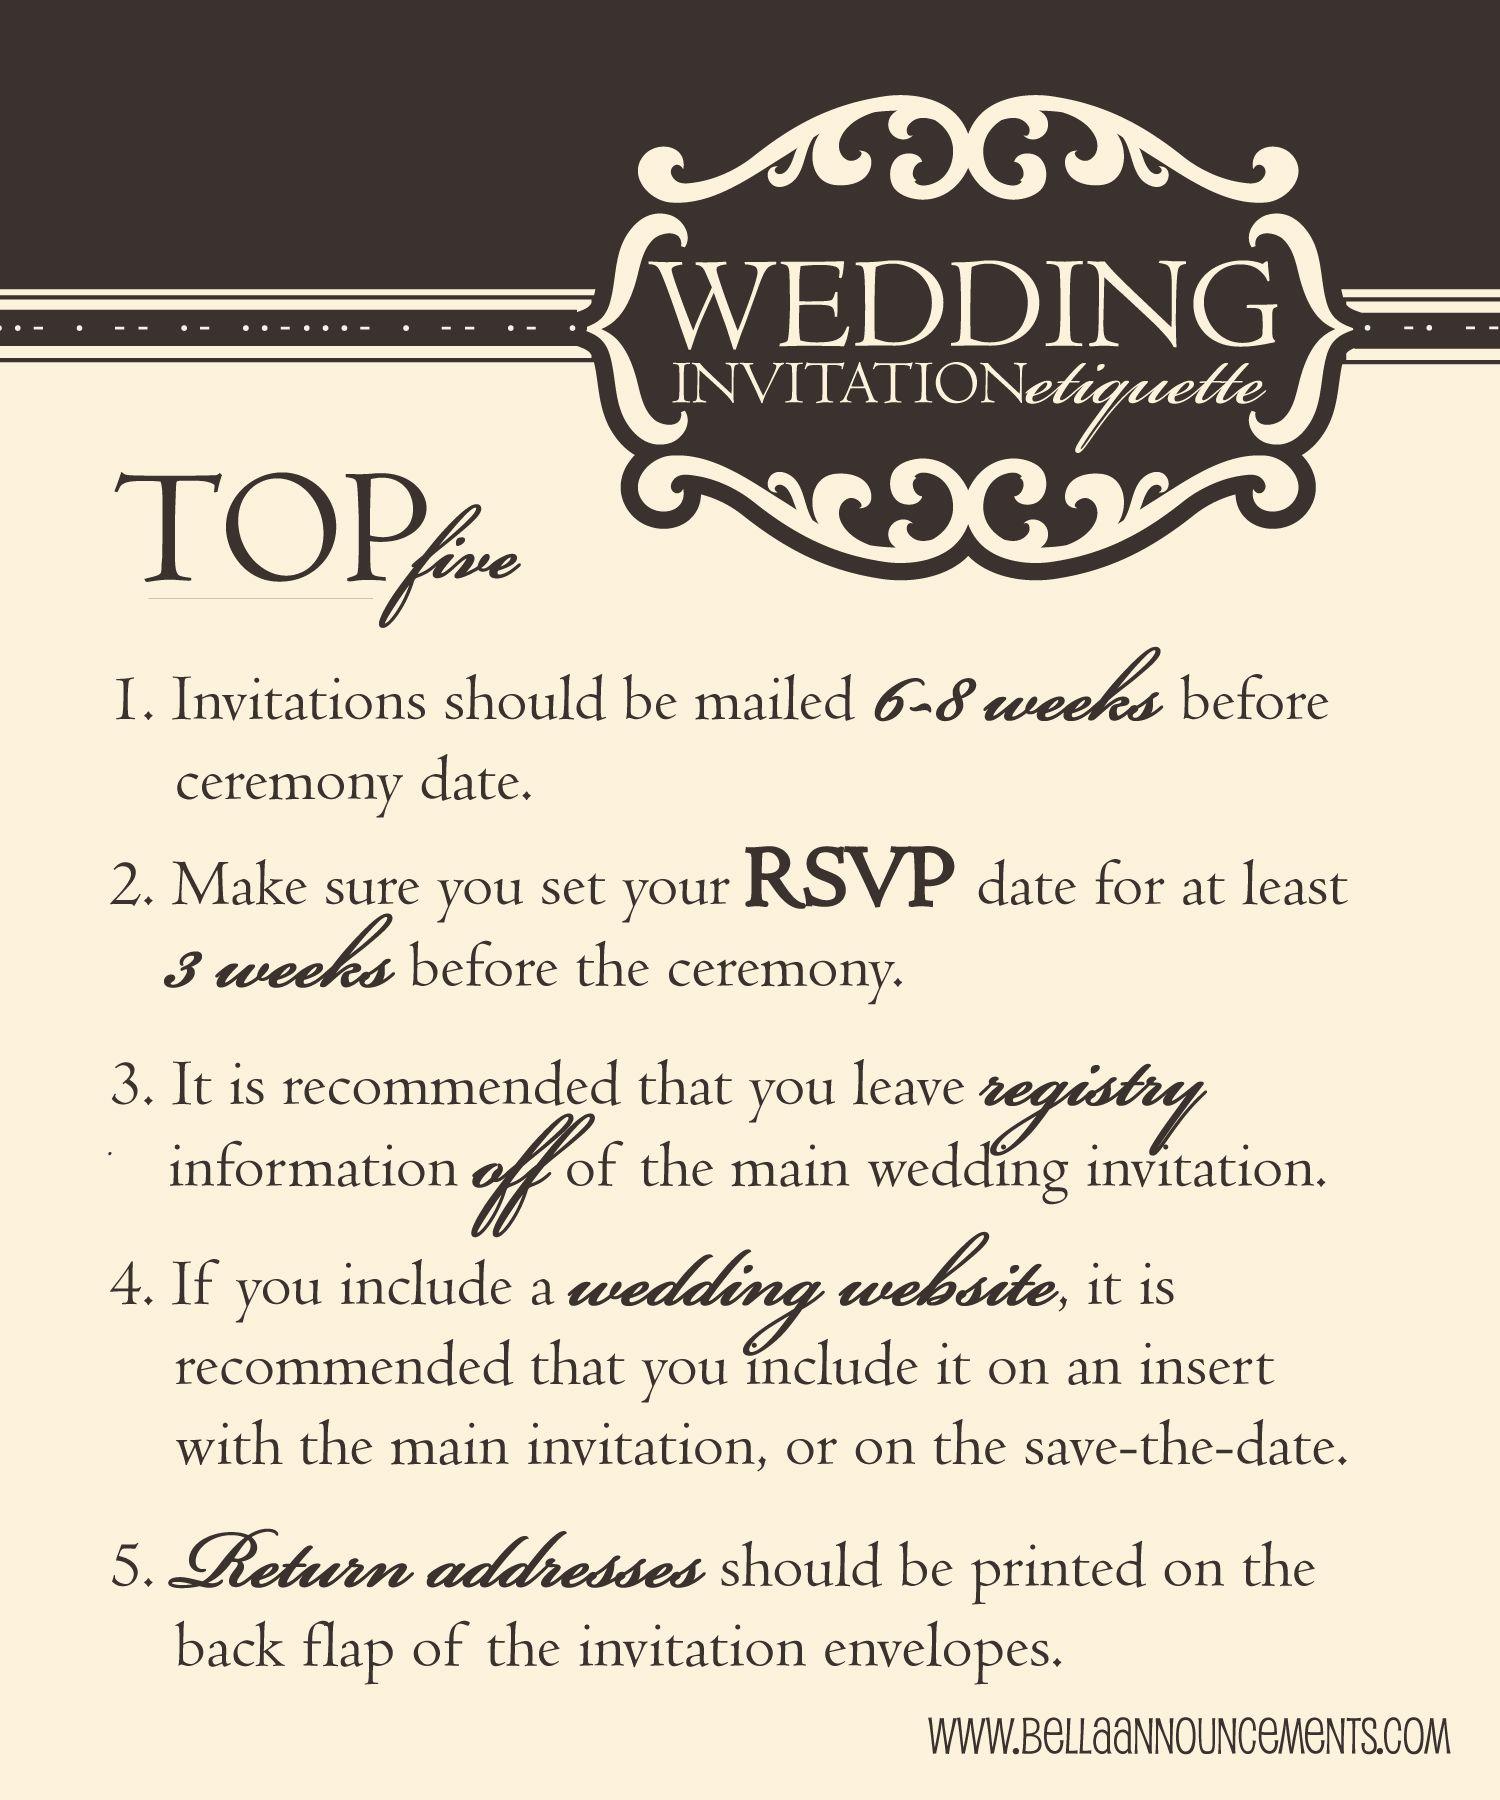 wedding etiquette, top five wedding etiquette Wedding